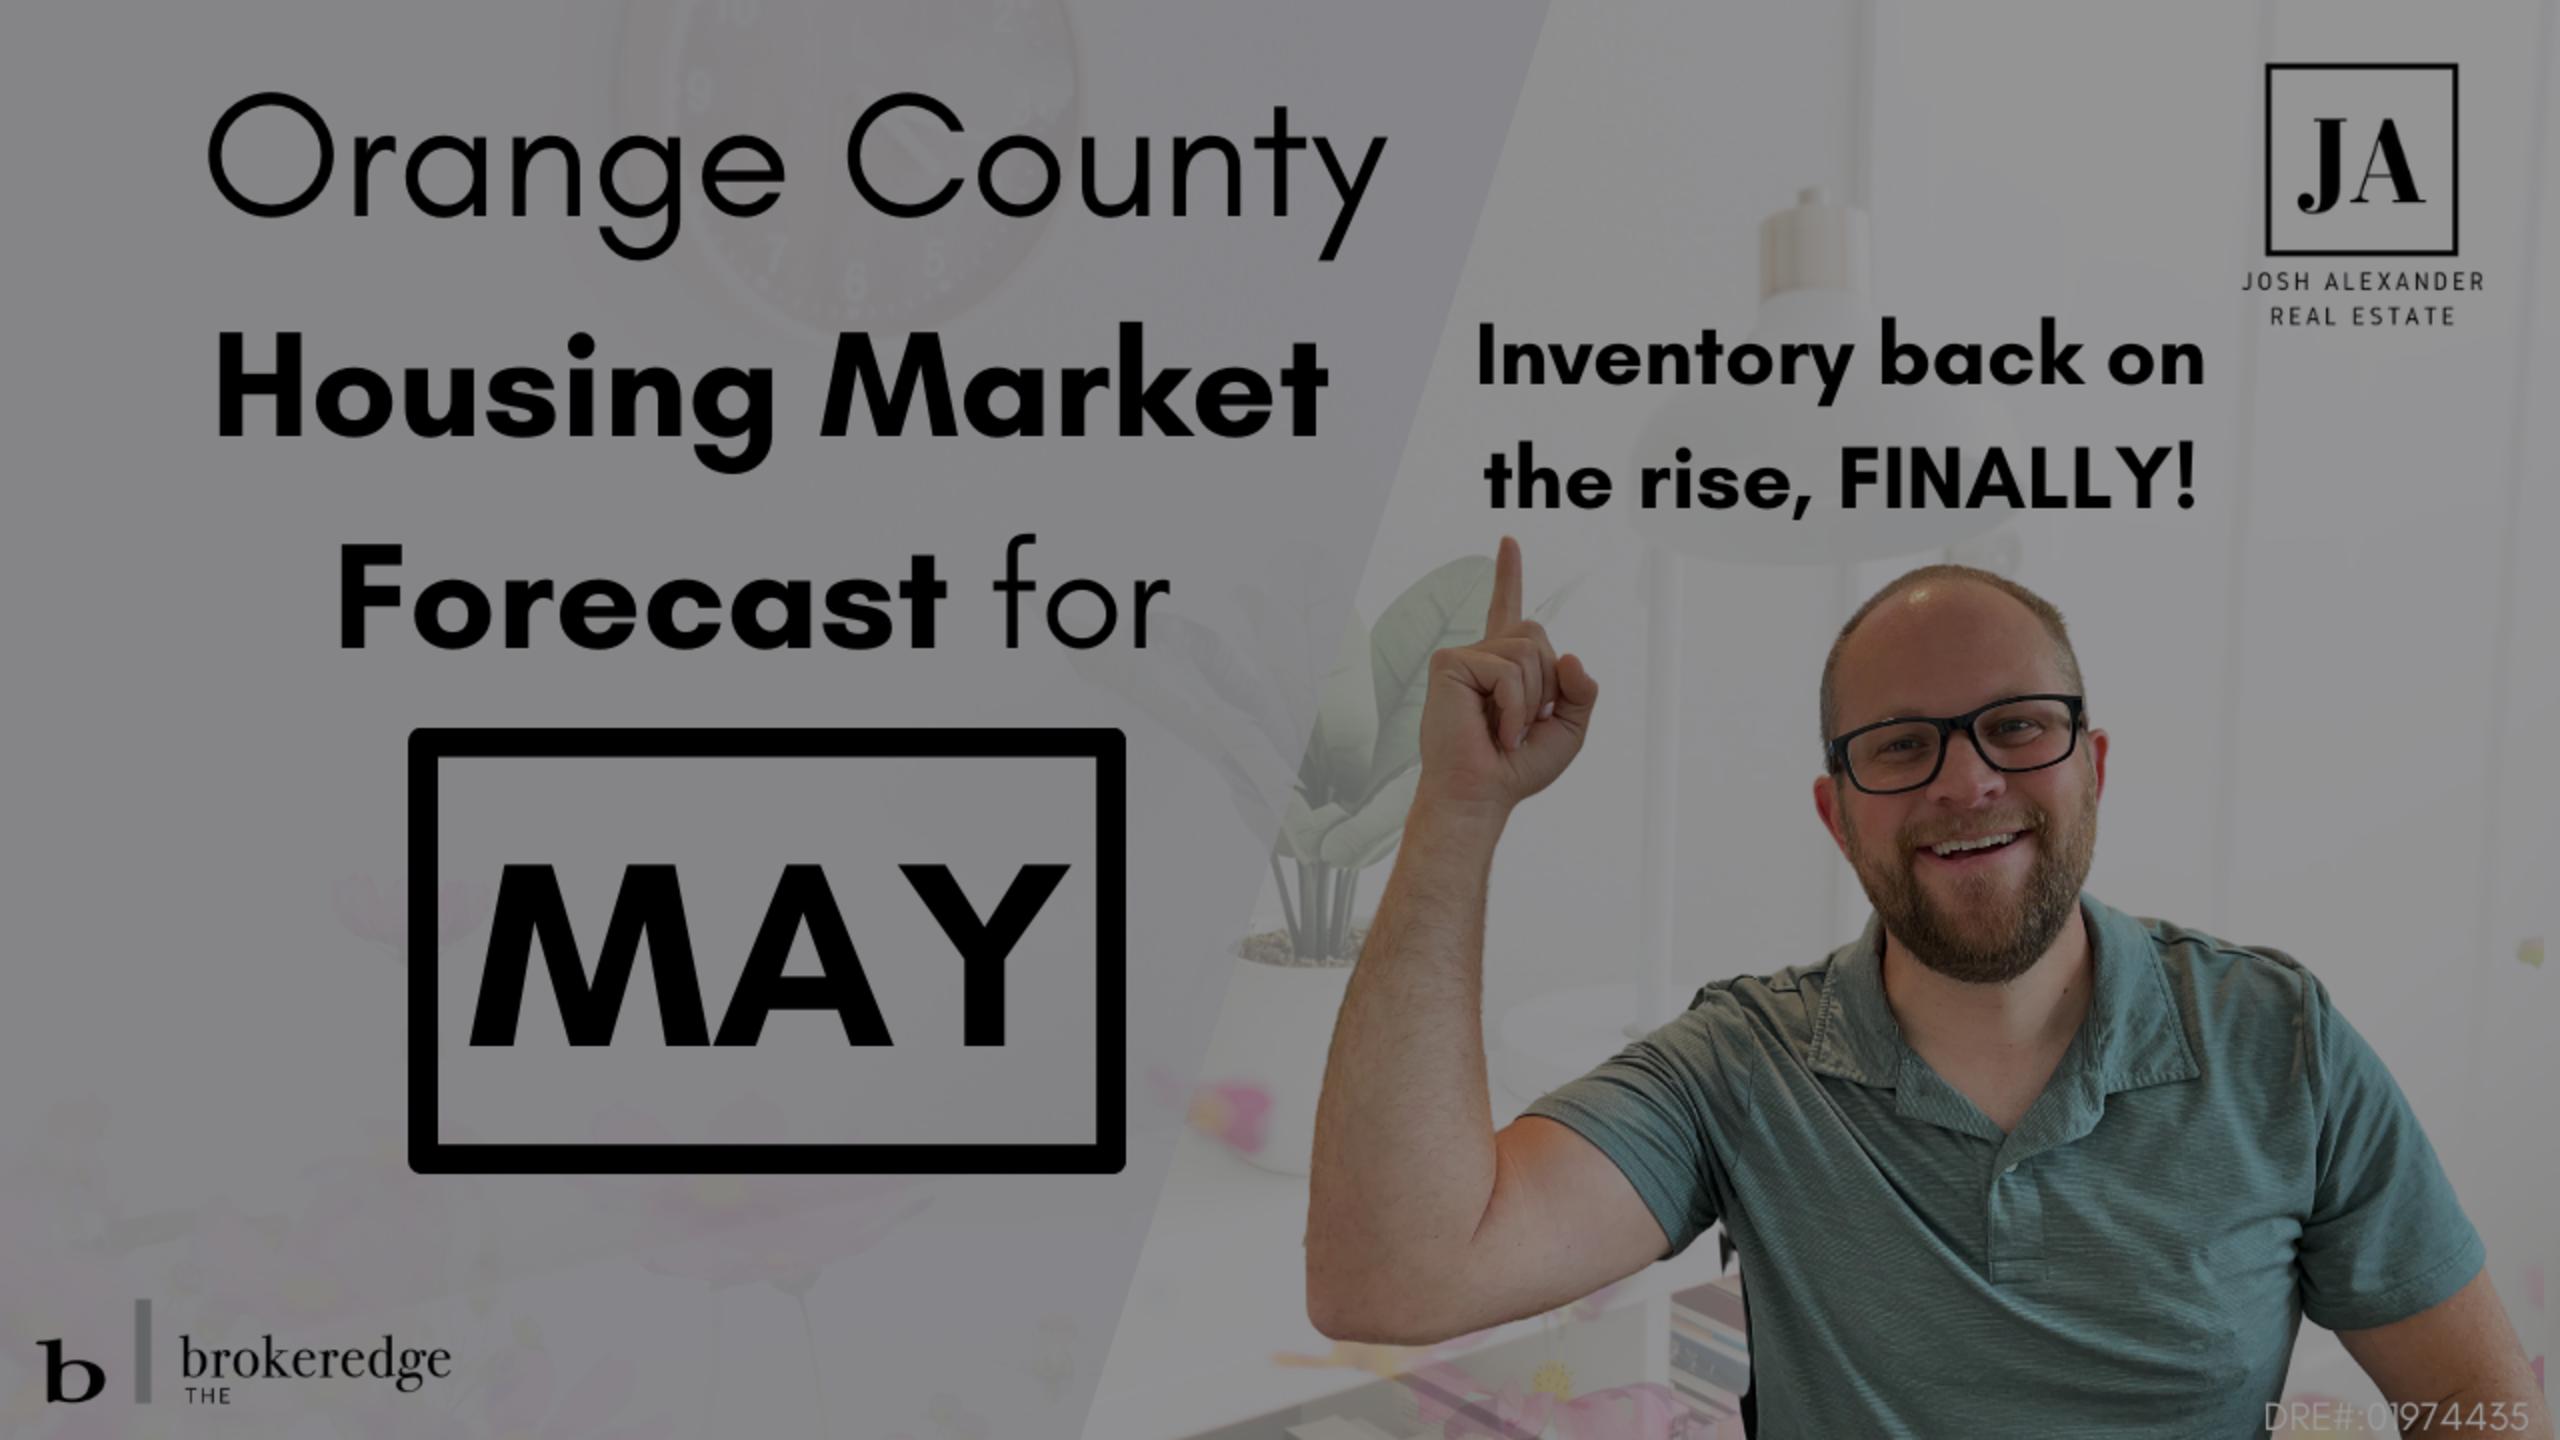 Orange County Housing Market Forecast for May